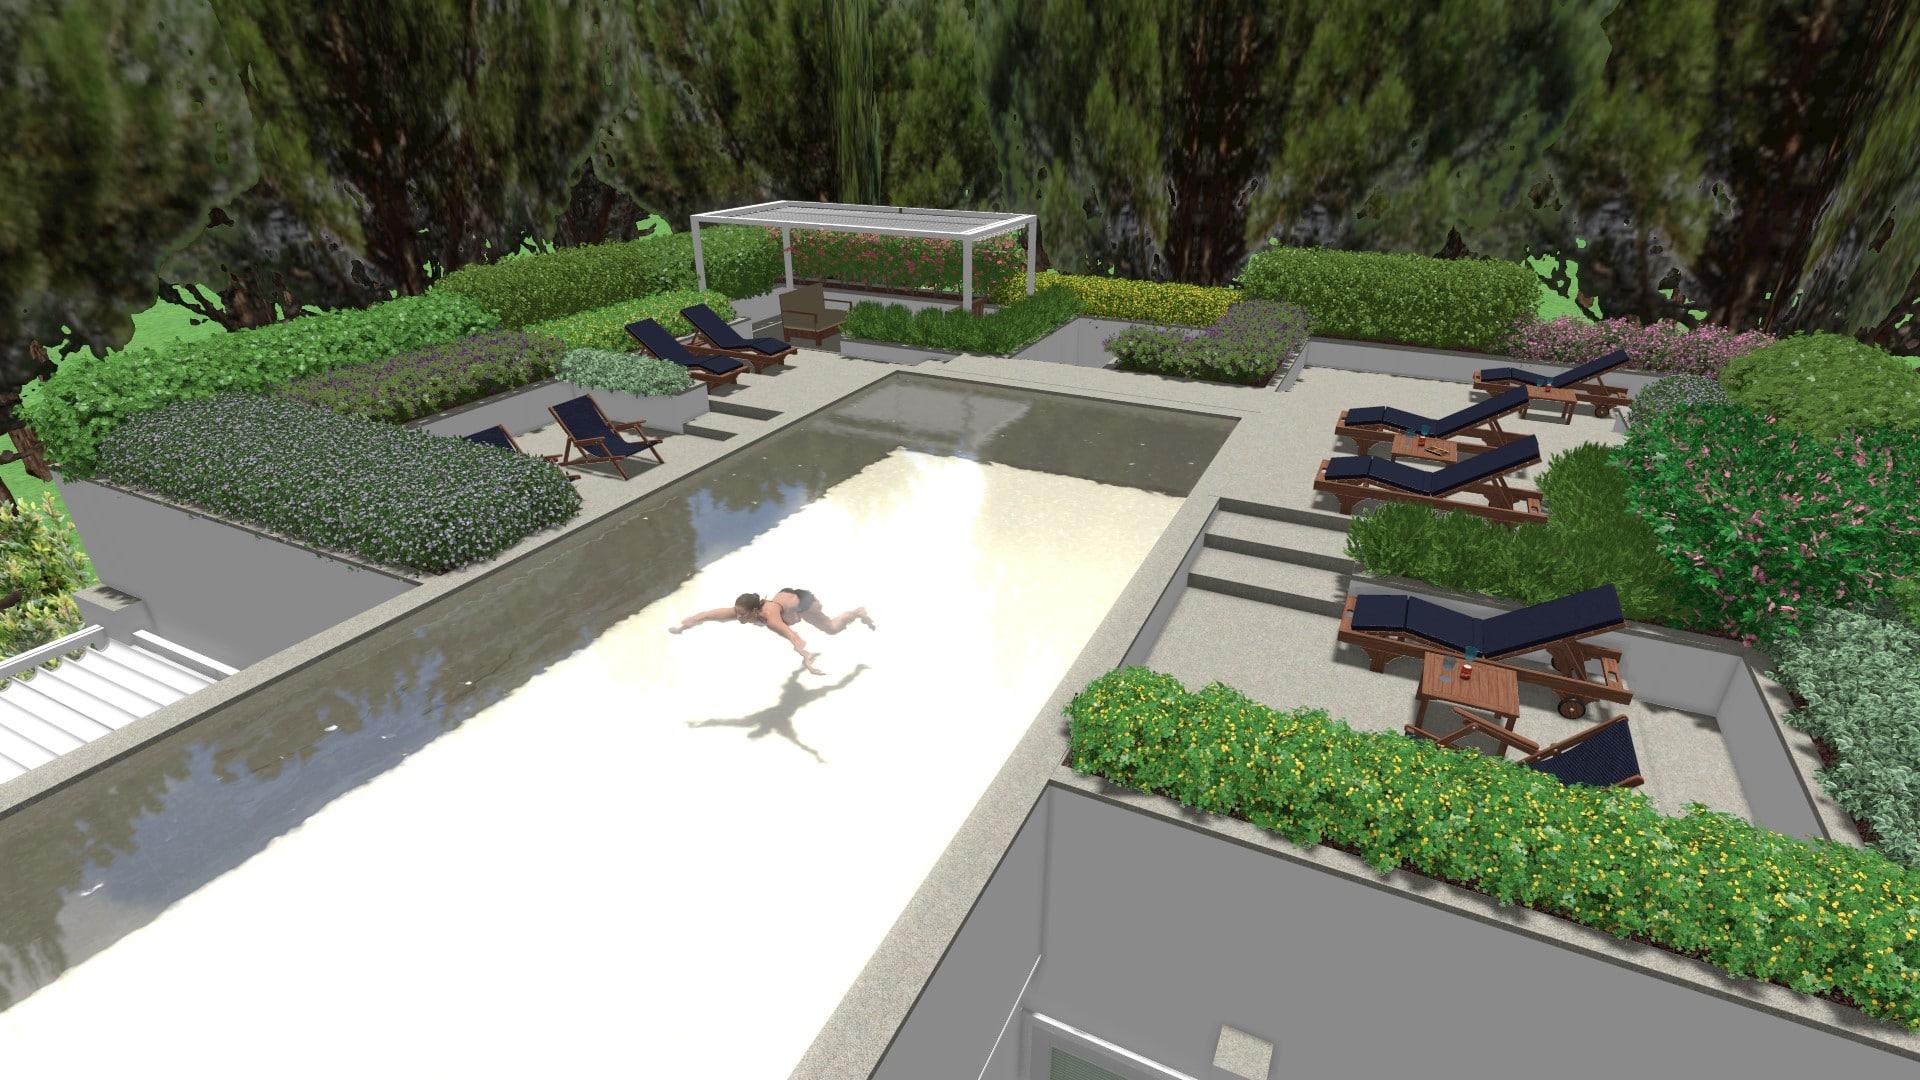 Emejing Progetto Terrazzo Pictures - Modern Home Design - orangetech.us